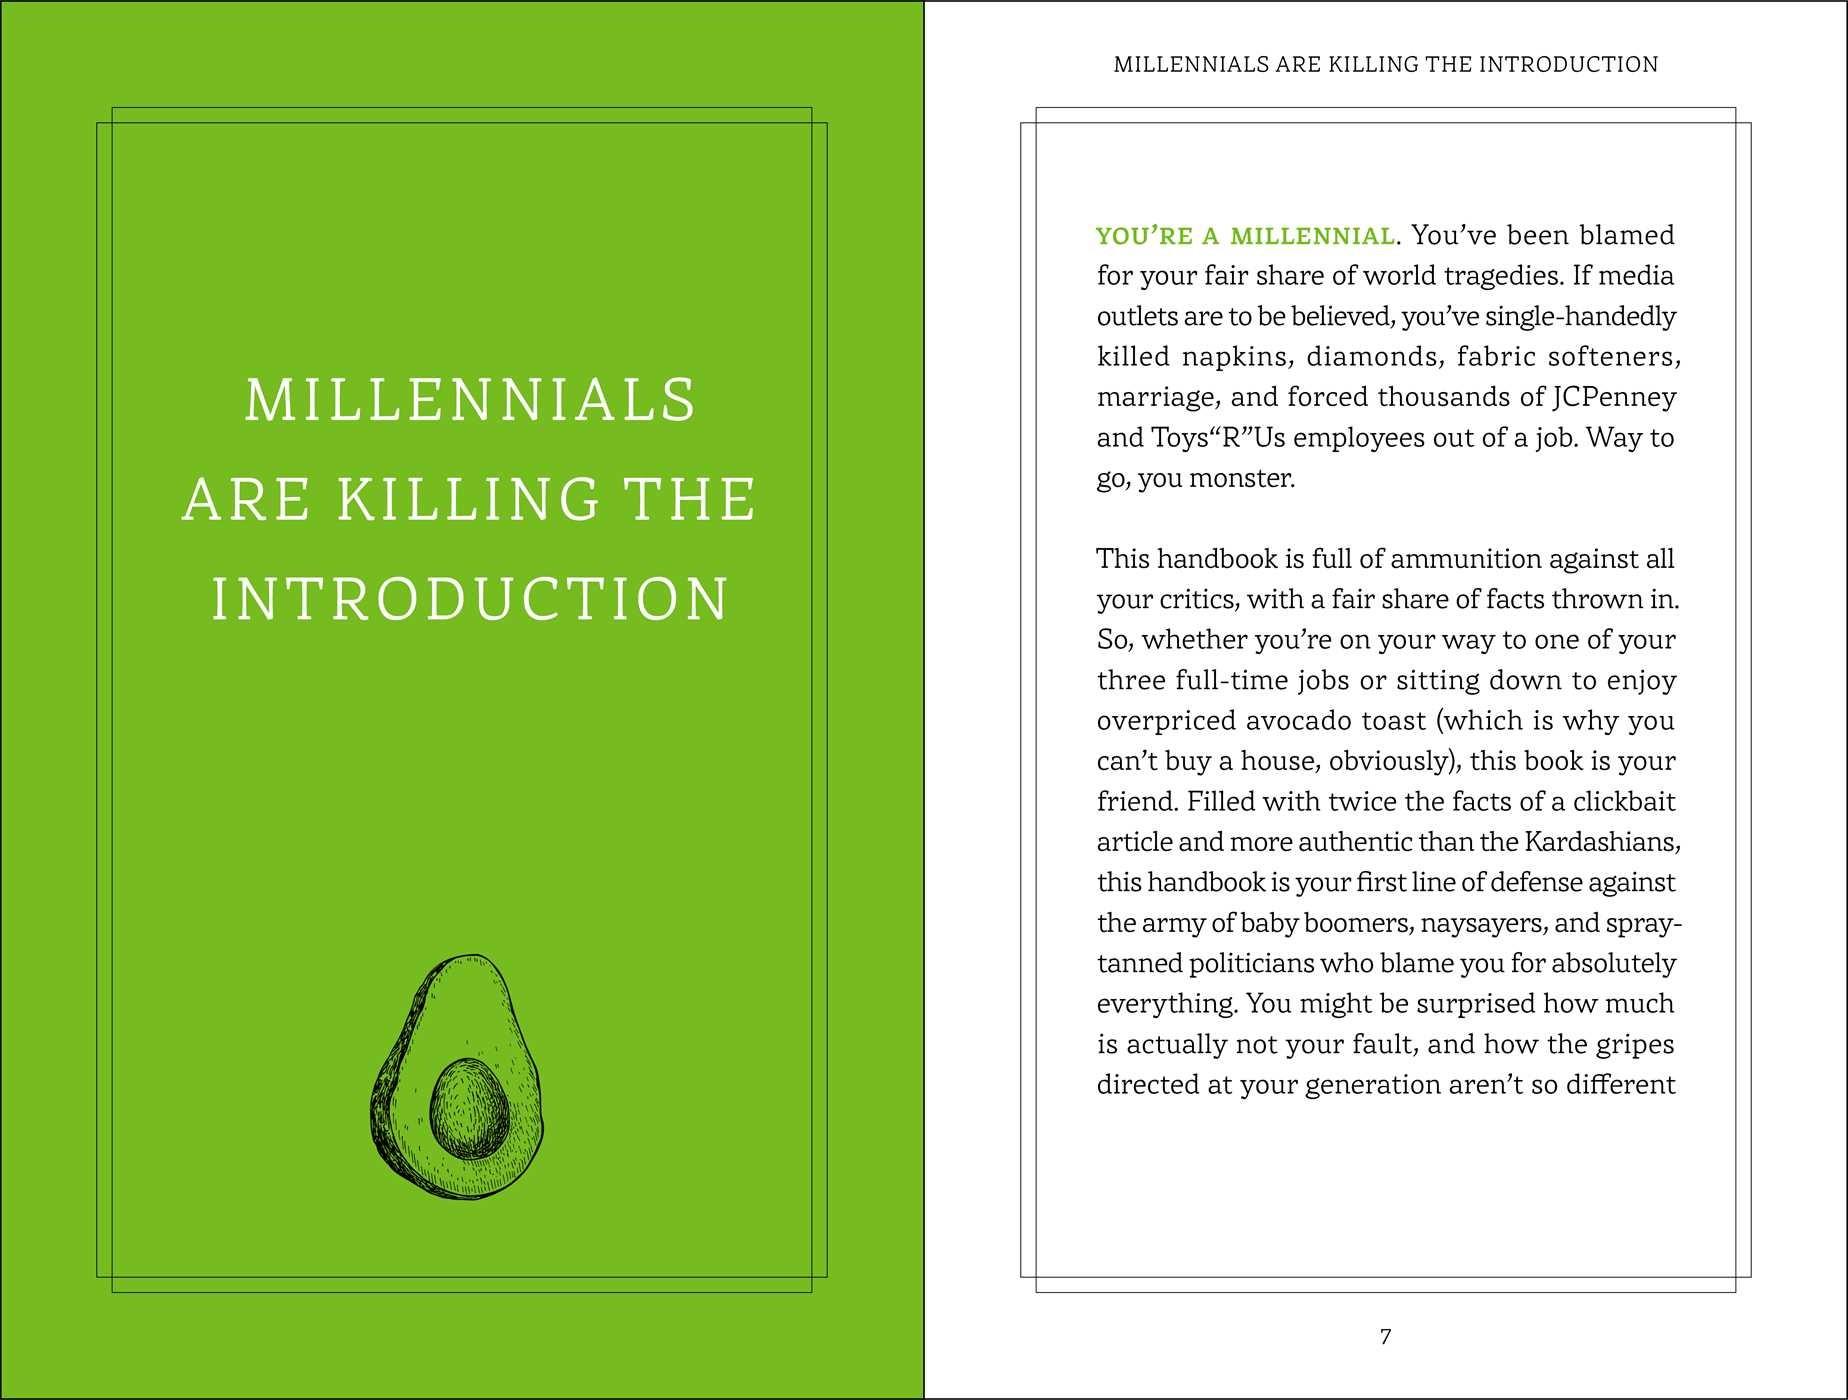 The avocado toast manifesto 9781604338560.in03